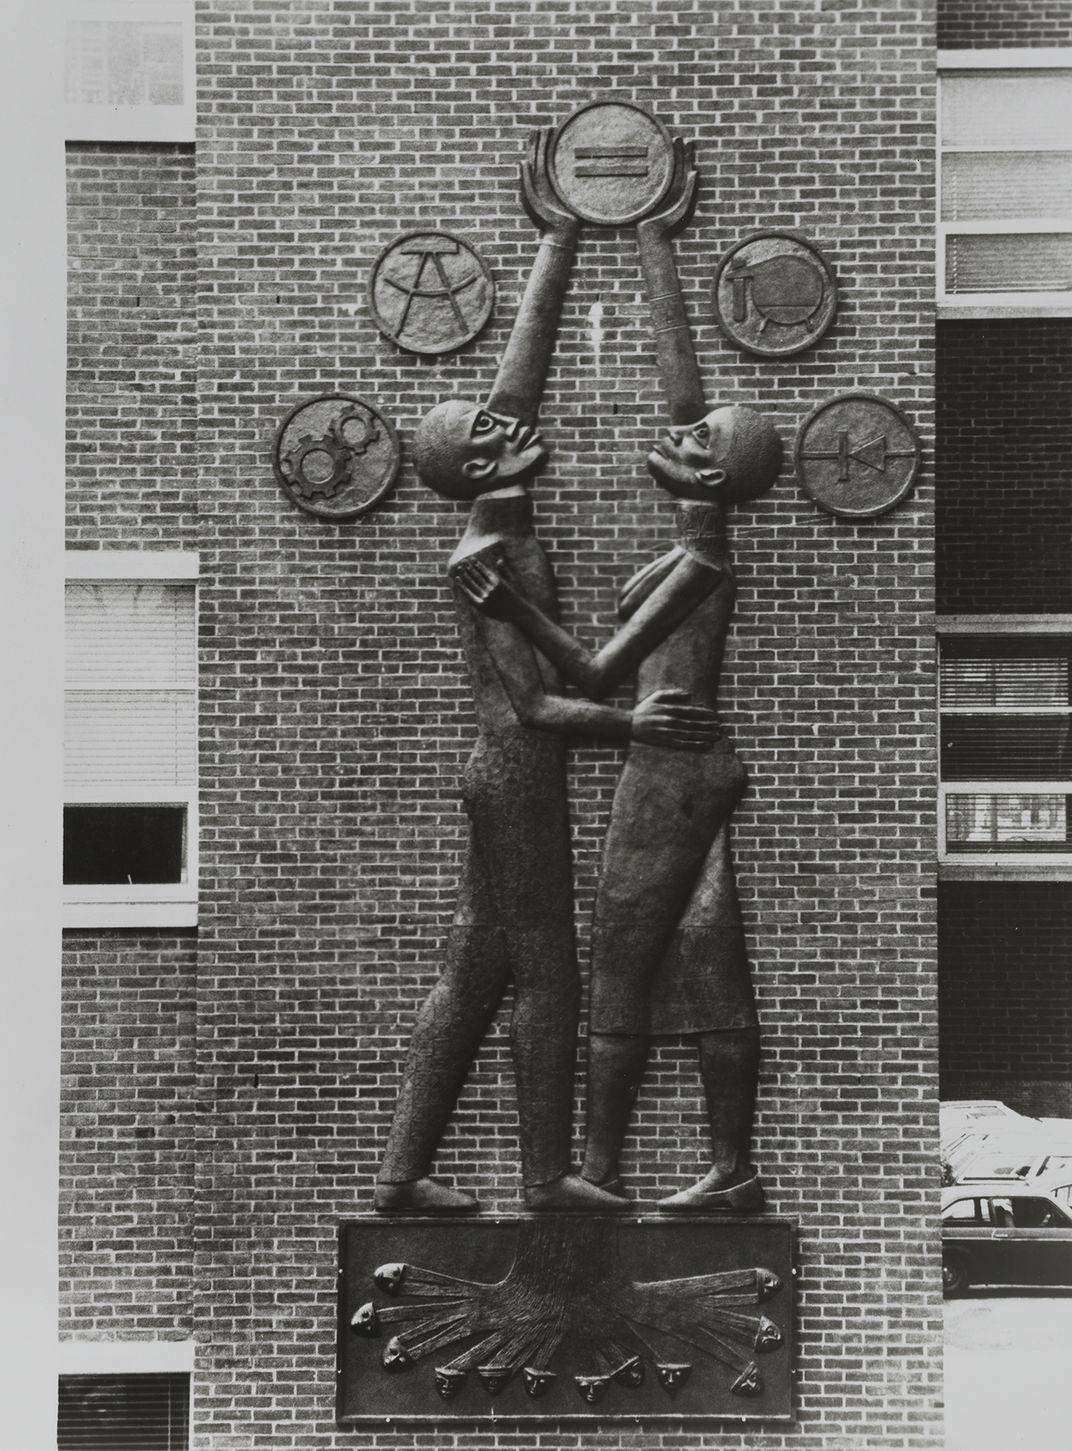 Elizabeth Catlett's sculpture Students Aspire on the campus of Howard University